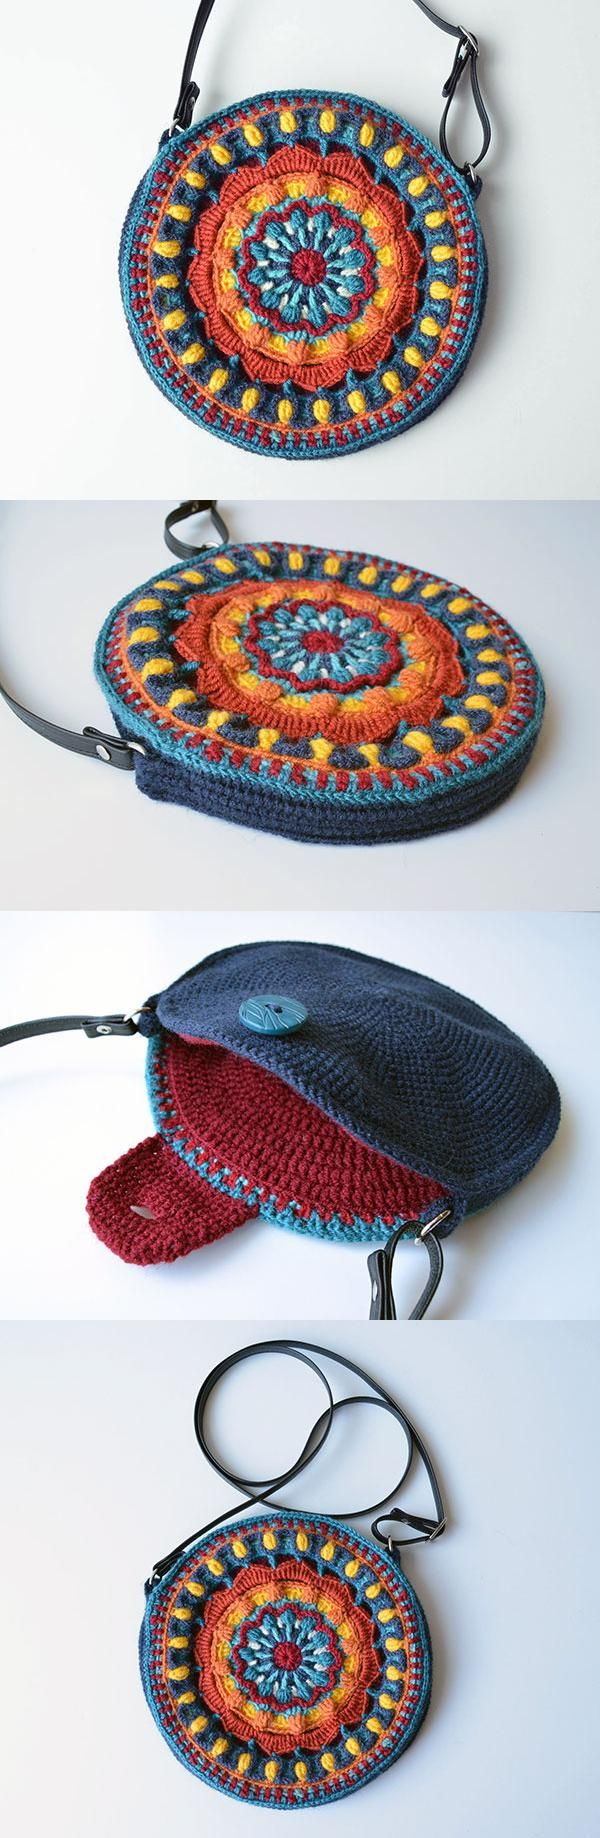 Kaleidoscope Mandala Bag Crochet Pattern